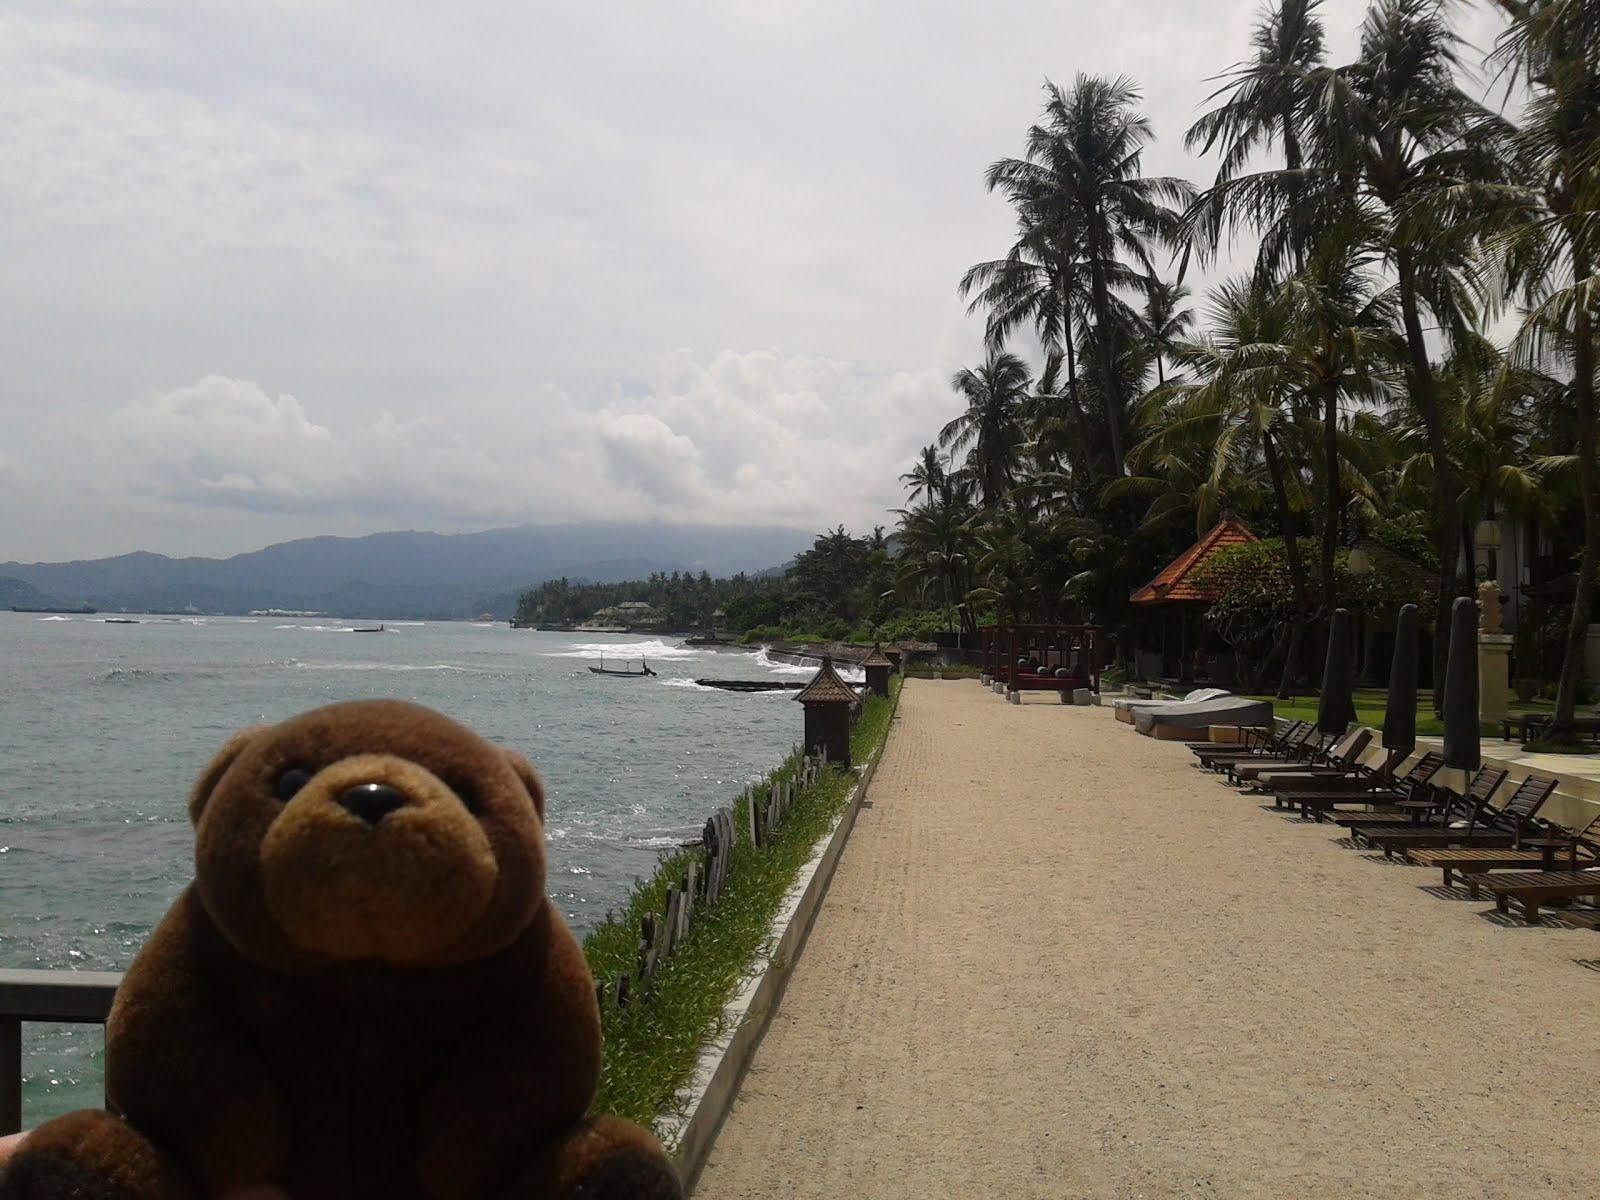 Teddy in Candidasa, Bali